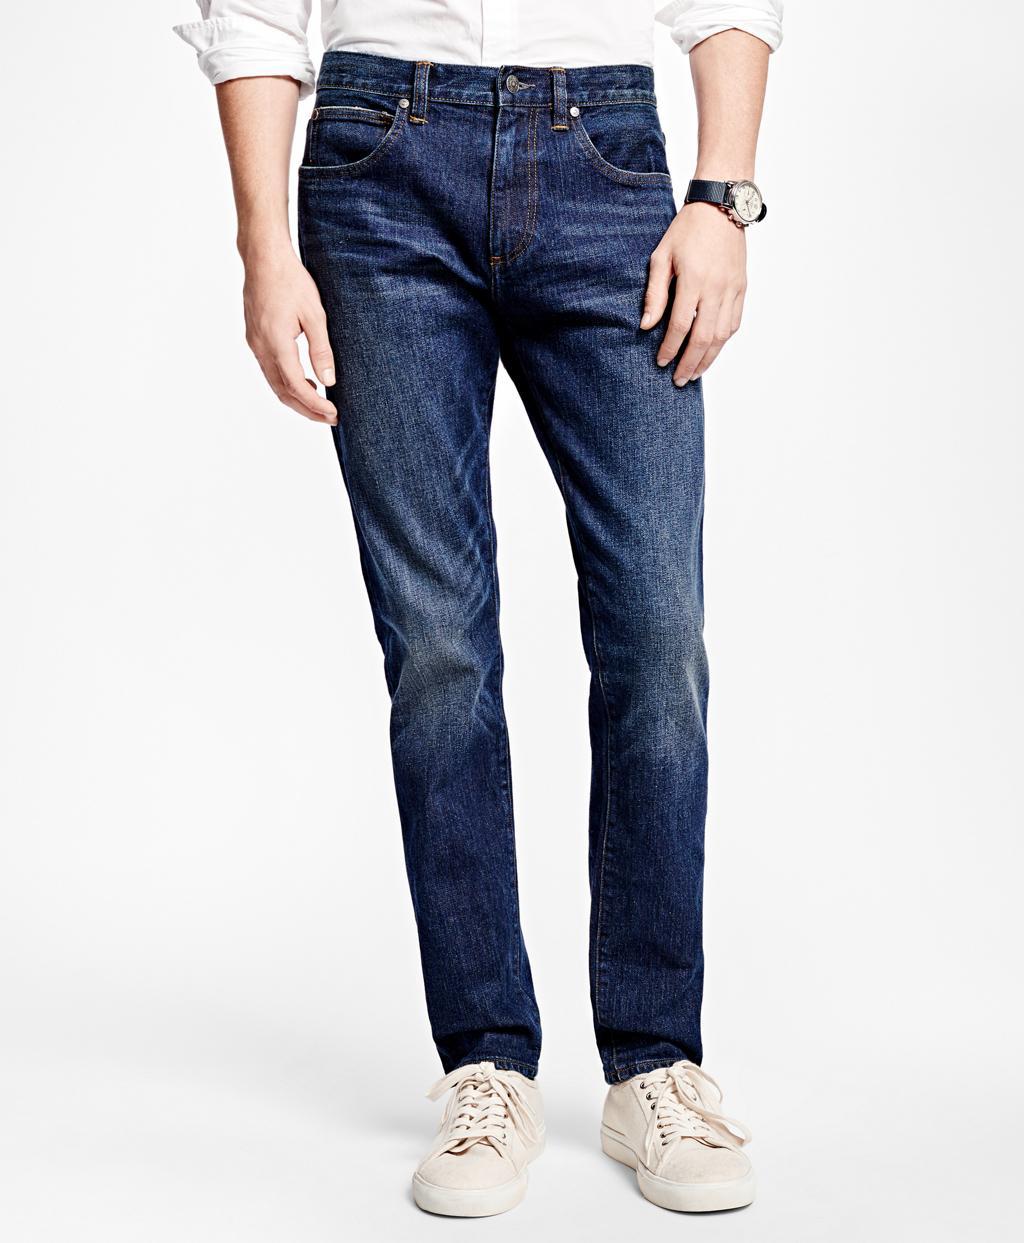 0c27861e2c Brooks Brothers 116 Slim Stretch Jeans In Indigo Denim in Blue for ...